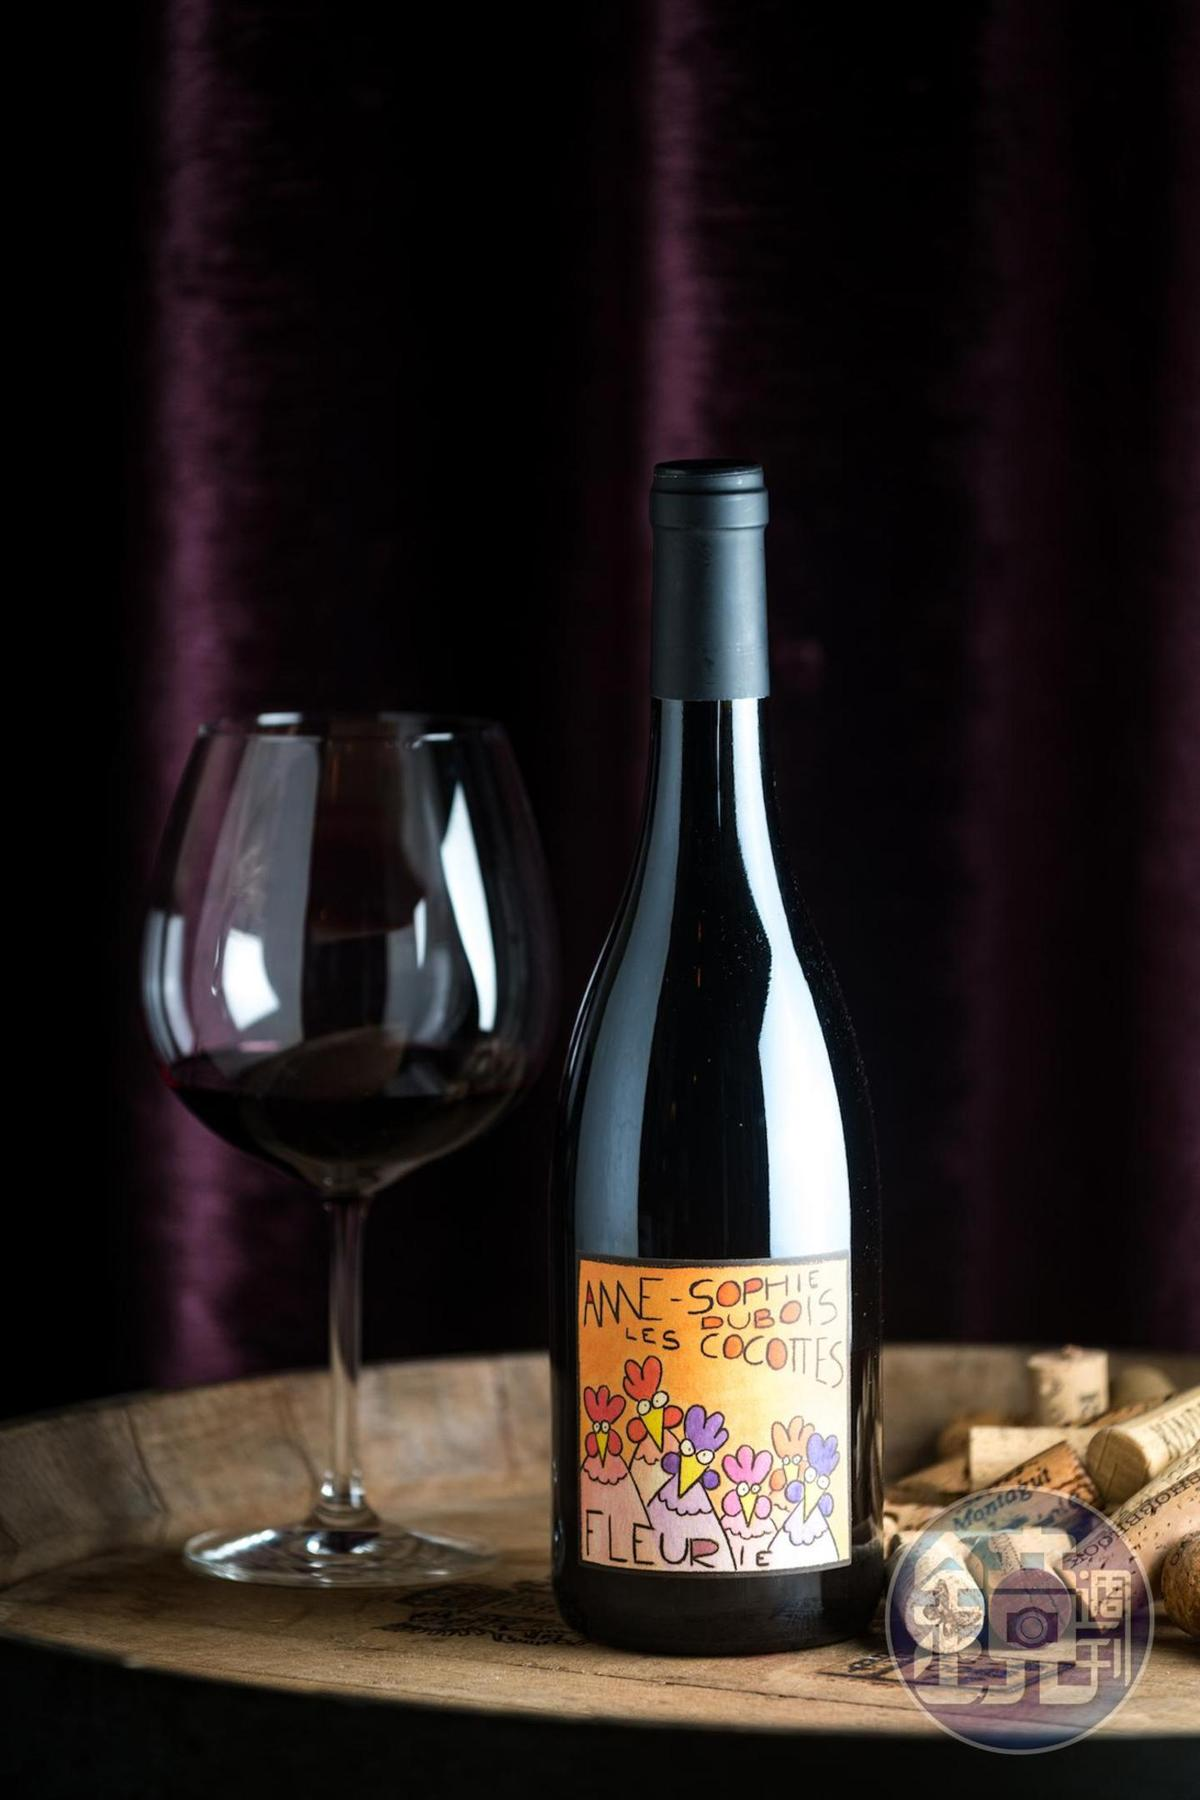 「Anne Sophie Dubois Fleurie Les Cocottes 2018 」可愛酒標由莊主親自手繪,使用原生酵母長時間發酵。(1,100元/瓶,代理商:維納瑞)